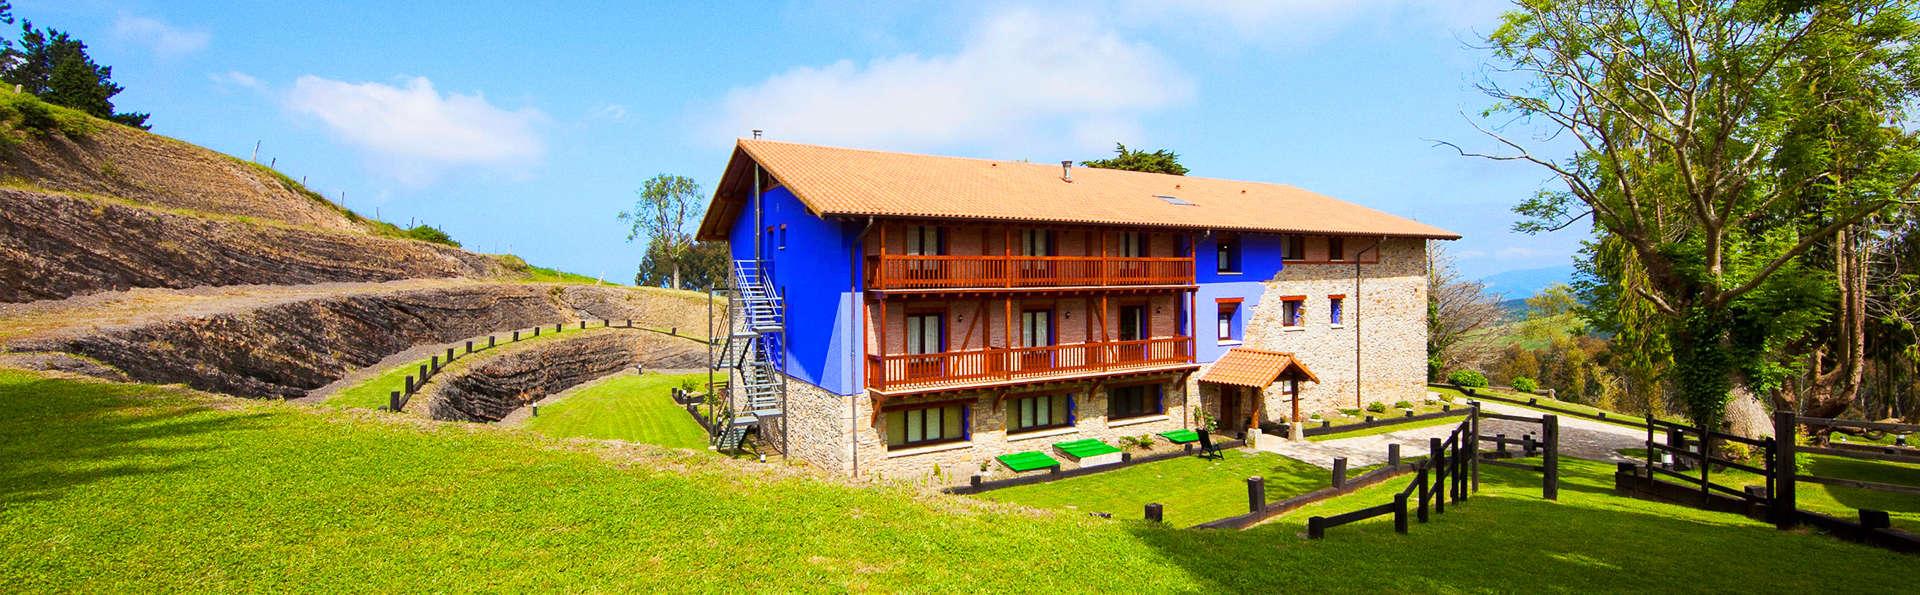 Hotel-Apartamento Rural Atxurra - EDIT_1_fachada.jpg